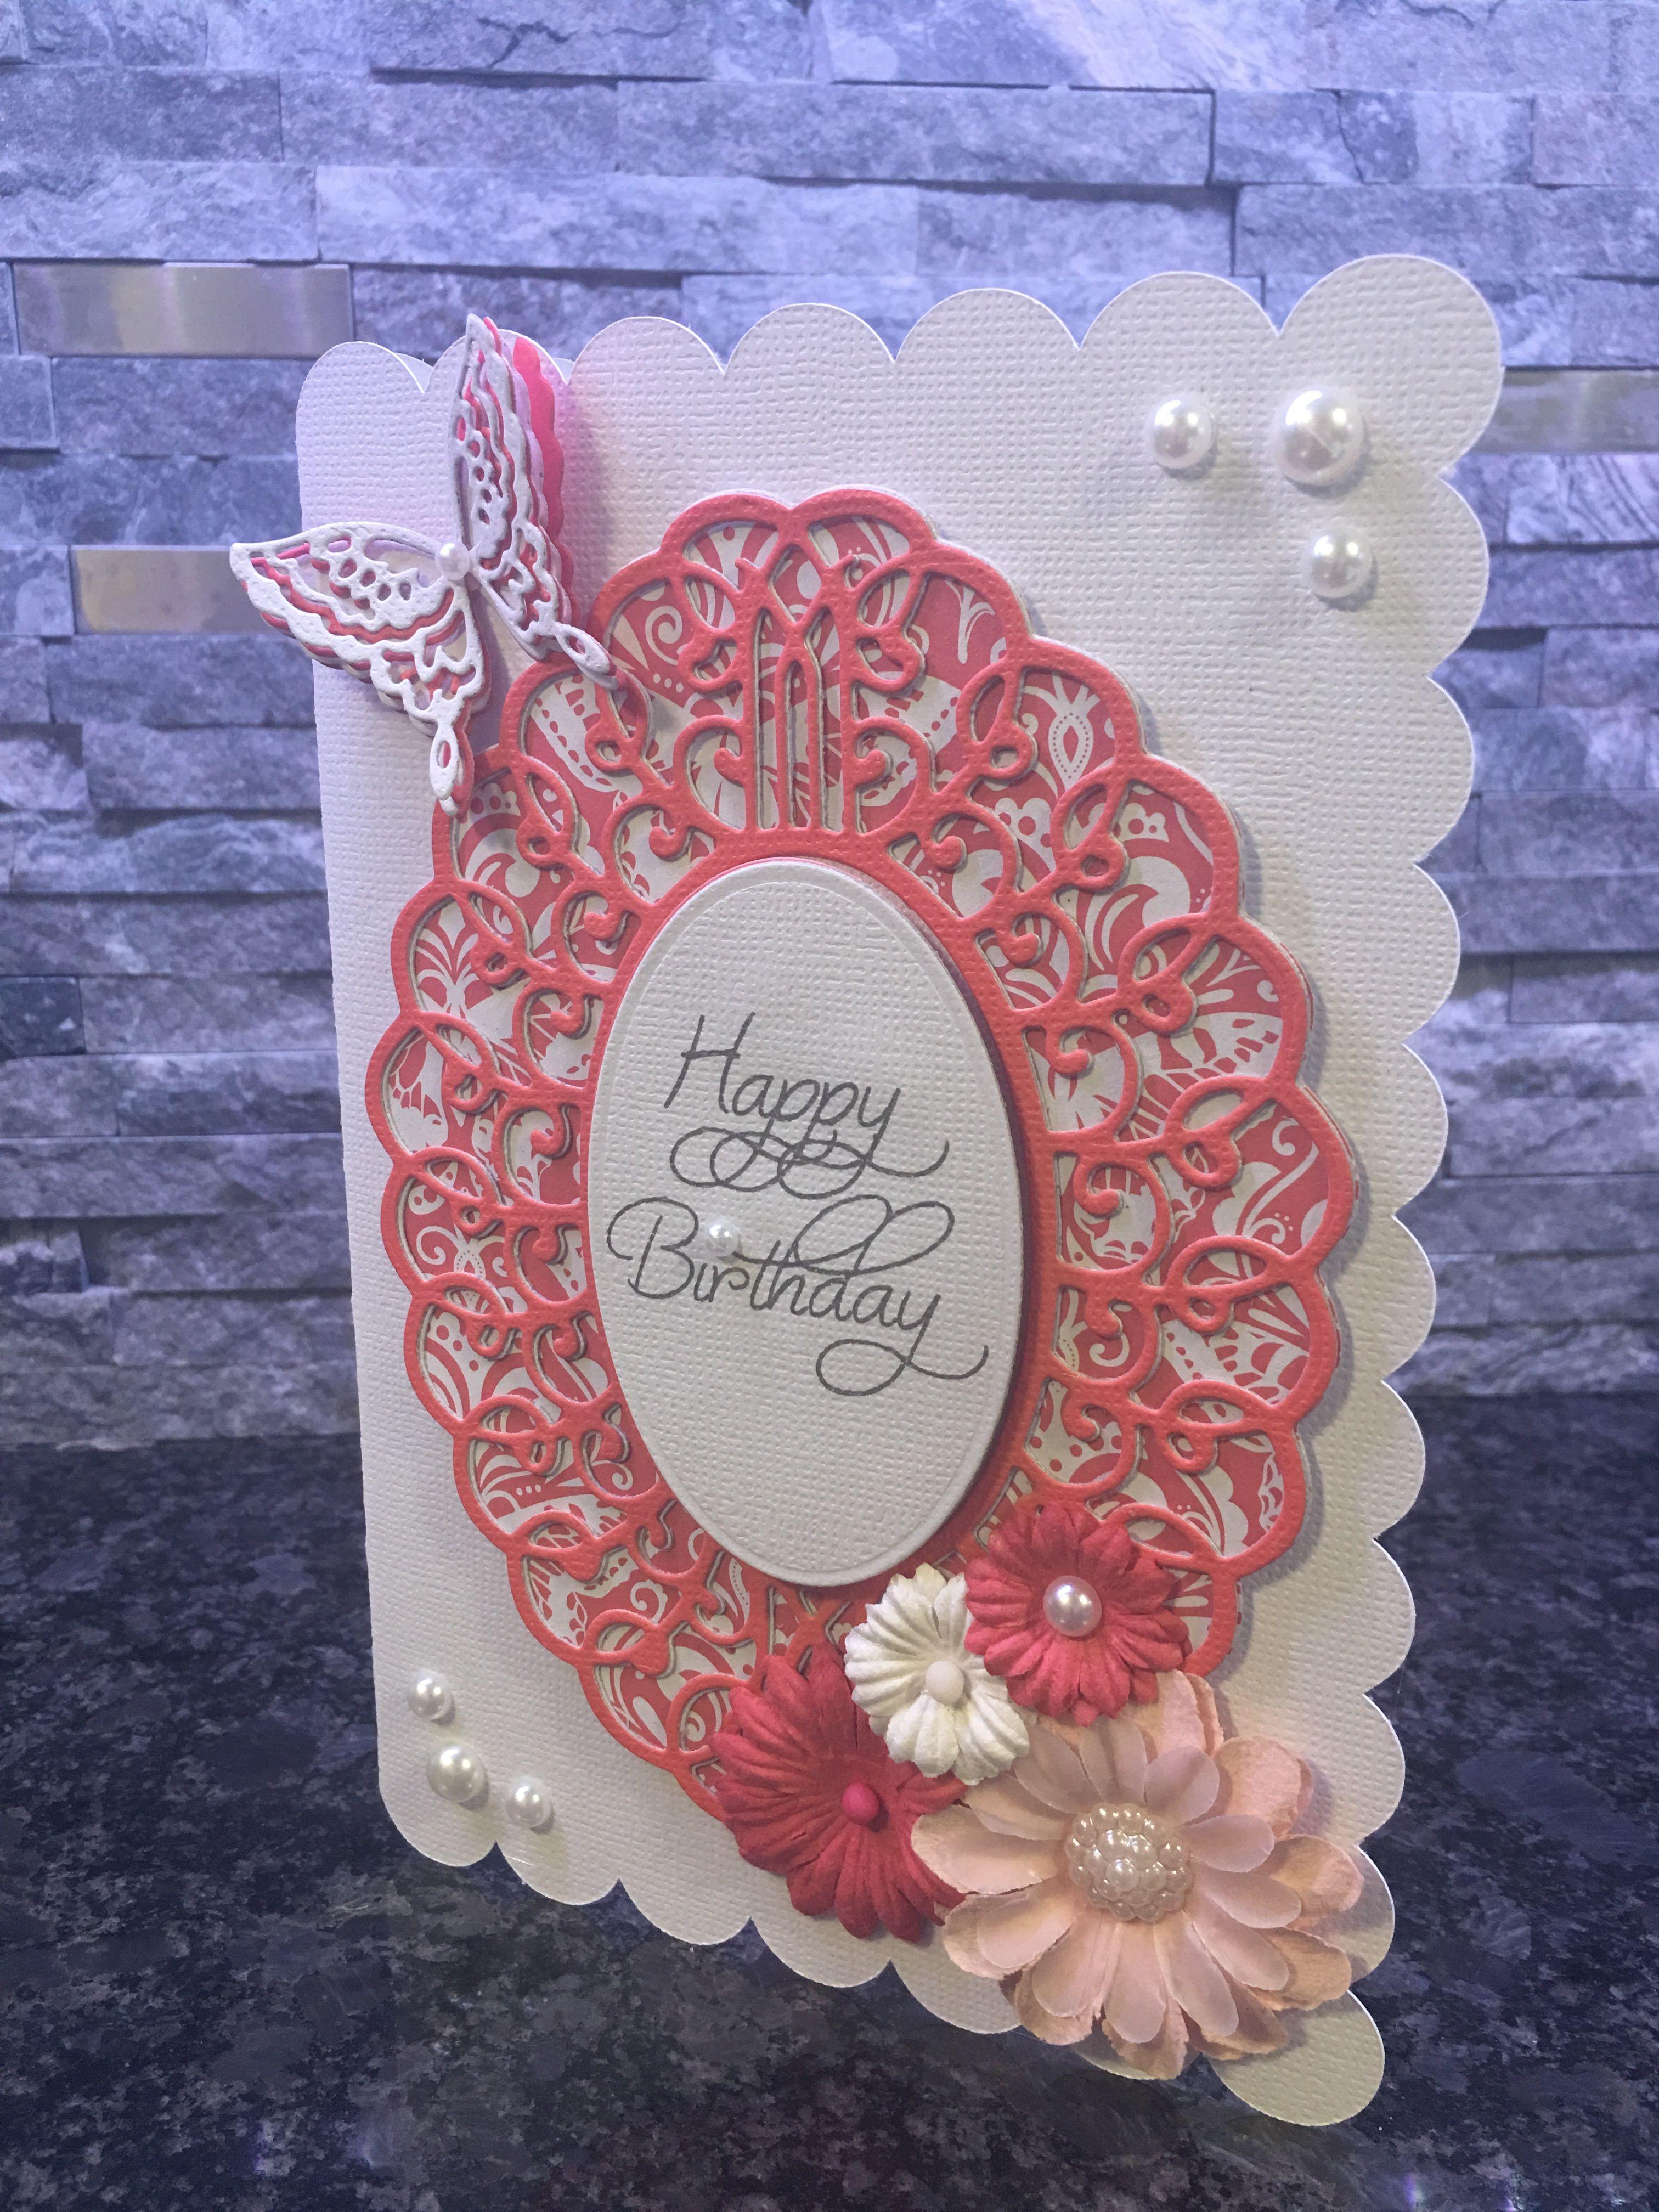 Pin by dorinda medley on my custom made greeting cards pinterest